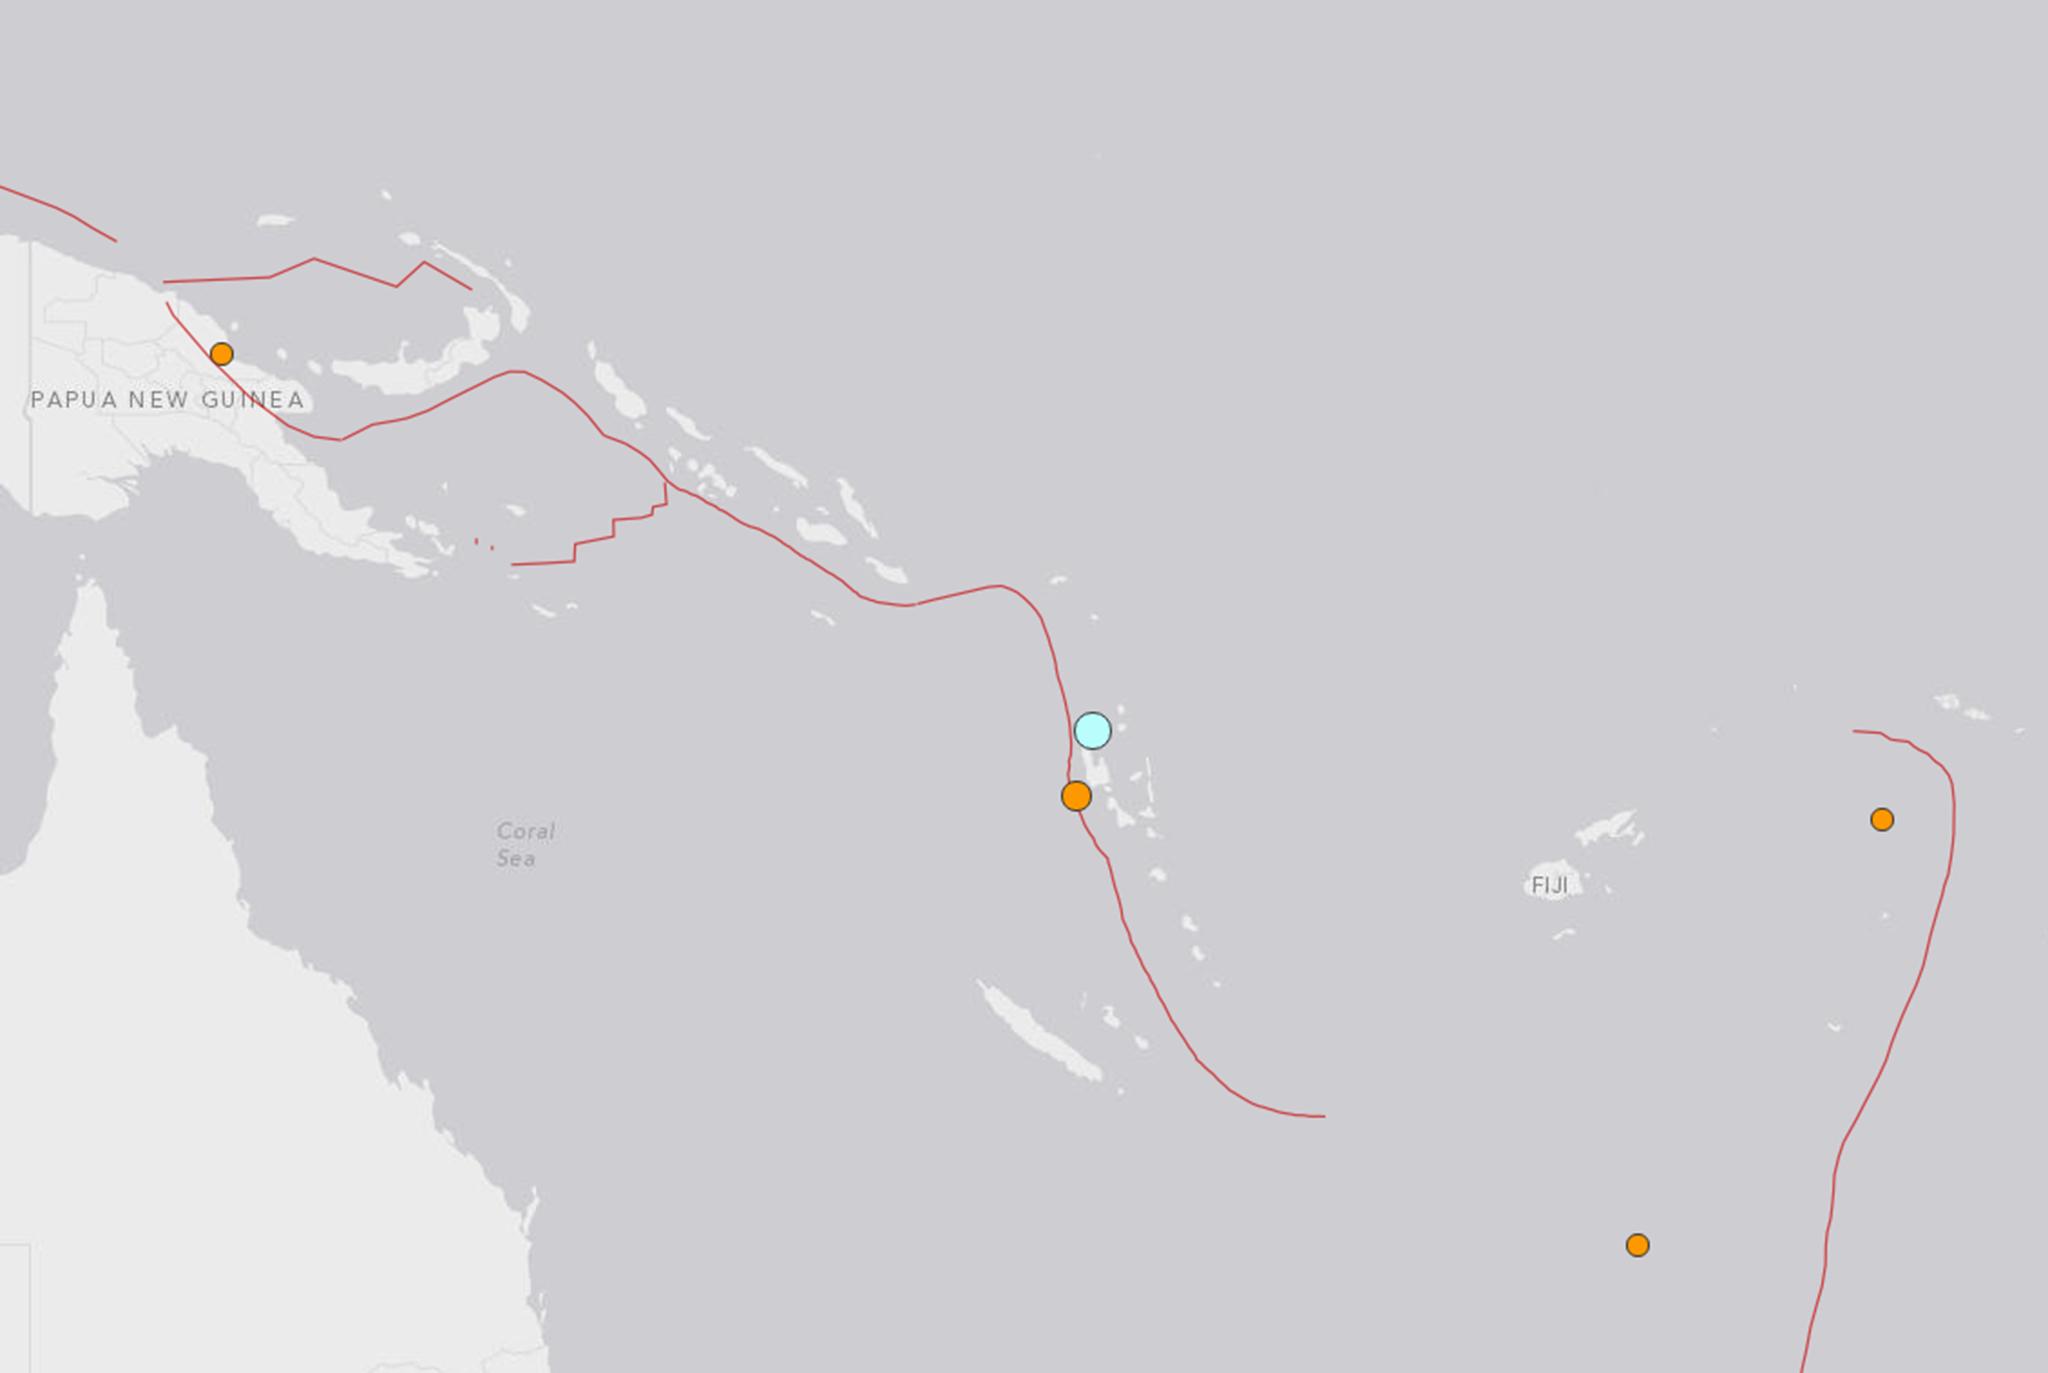 Earthquake today: Tsunami alert off Vanuatu after 7 2 tremor